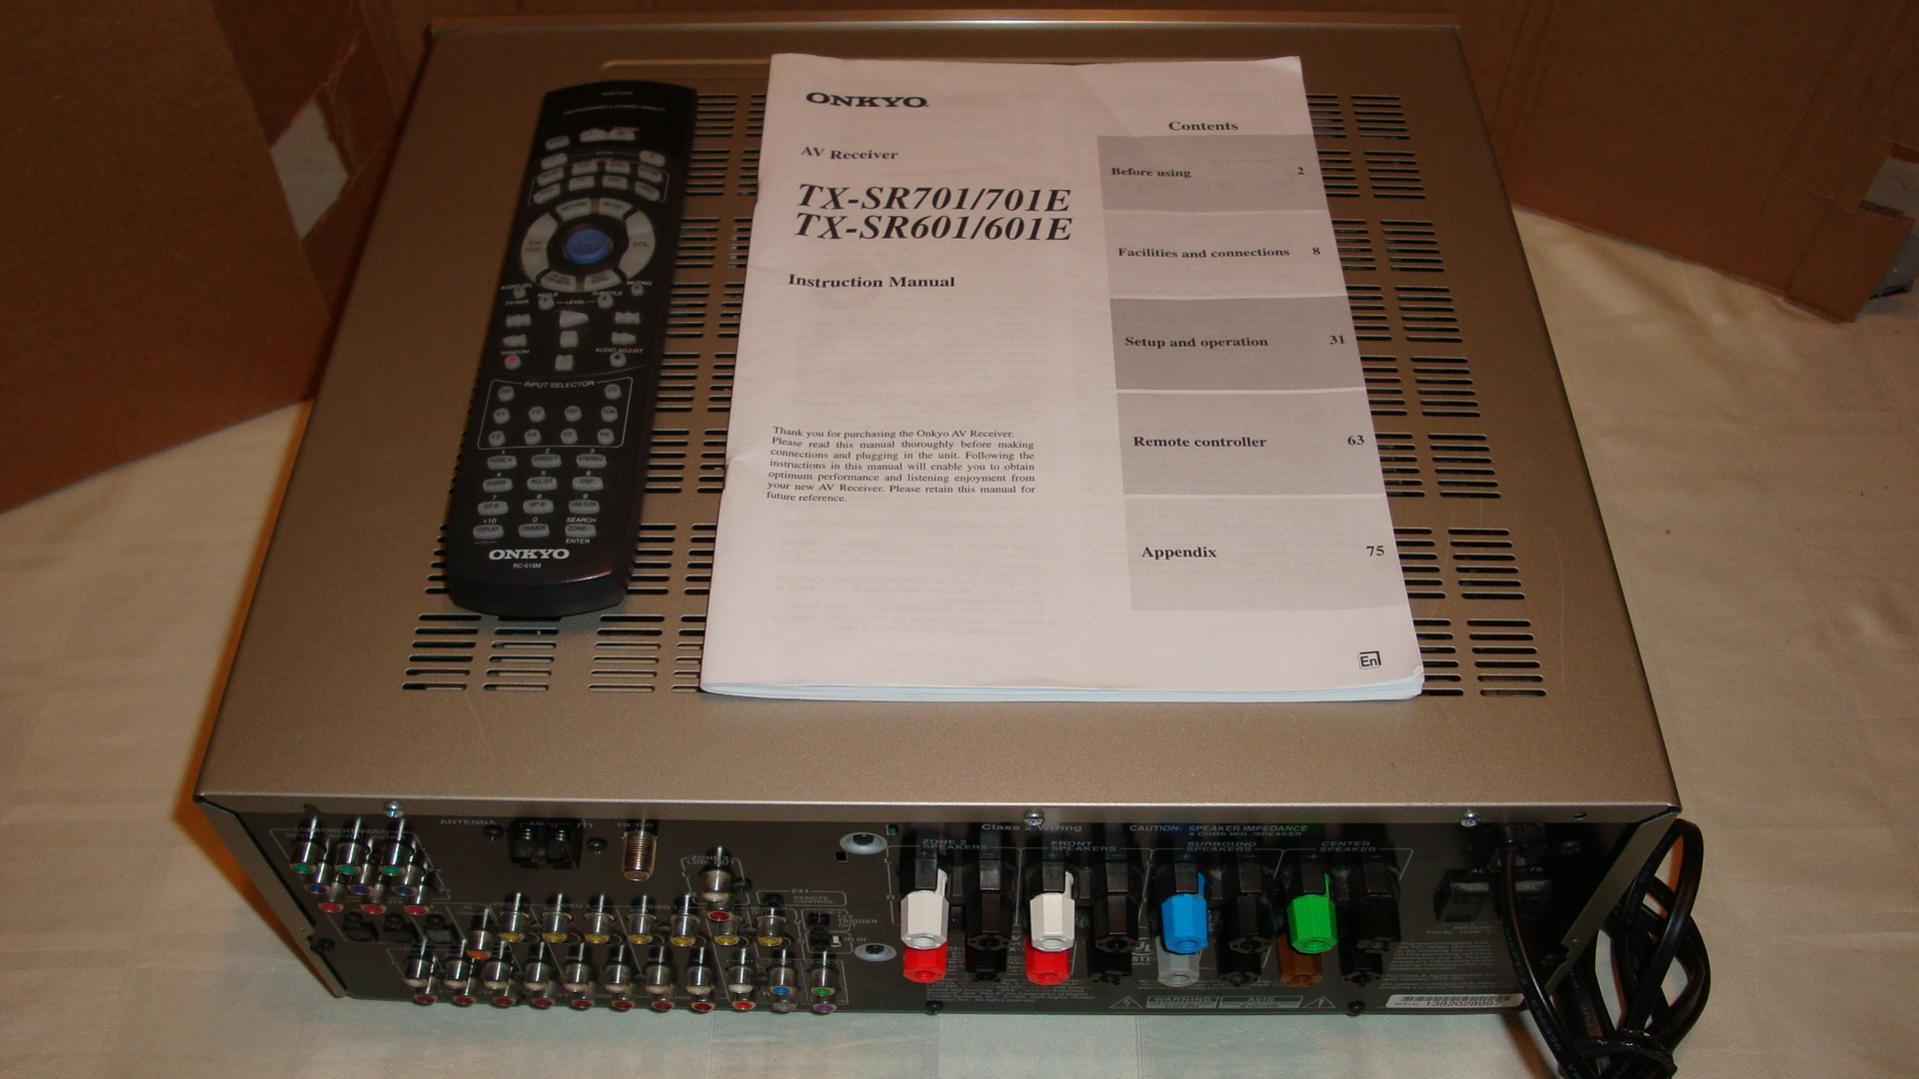 onkyo tx sr601 surround receiver polk audio rh forum polkaudio com onkyo tx-sr601 manual pdf onkyo tx-sr601 review